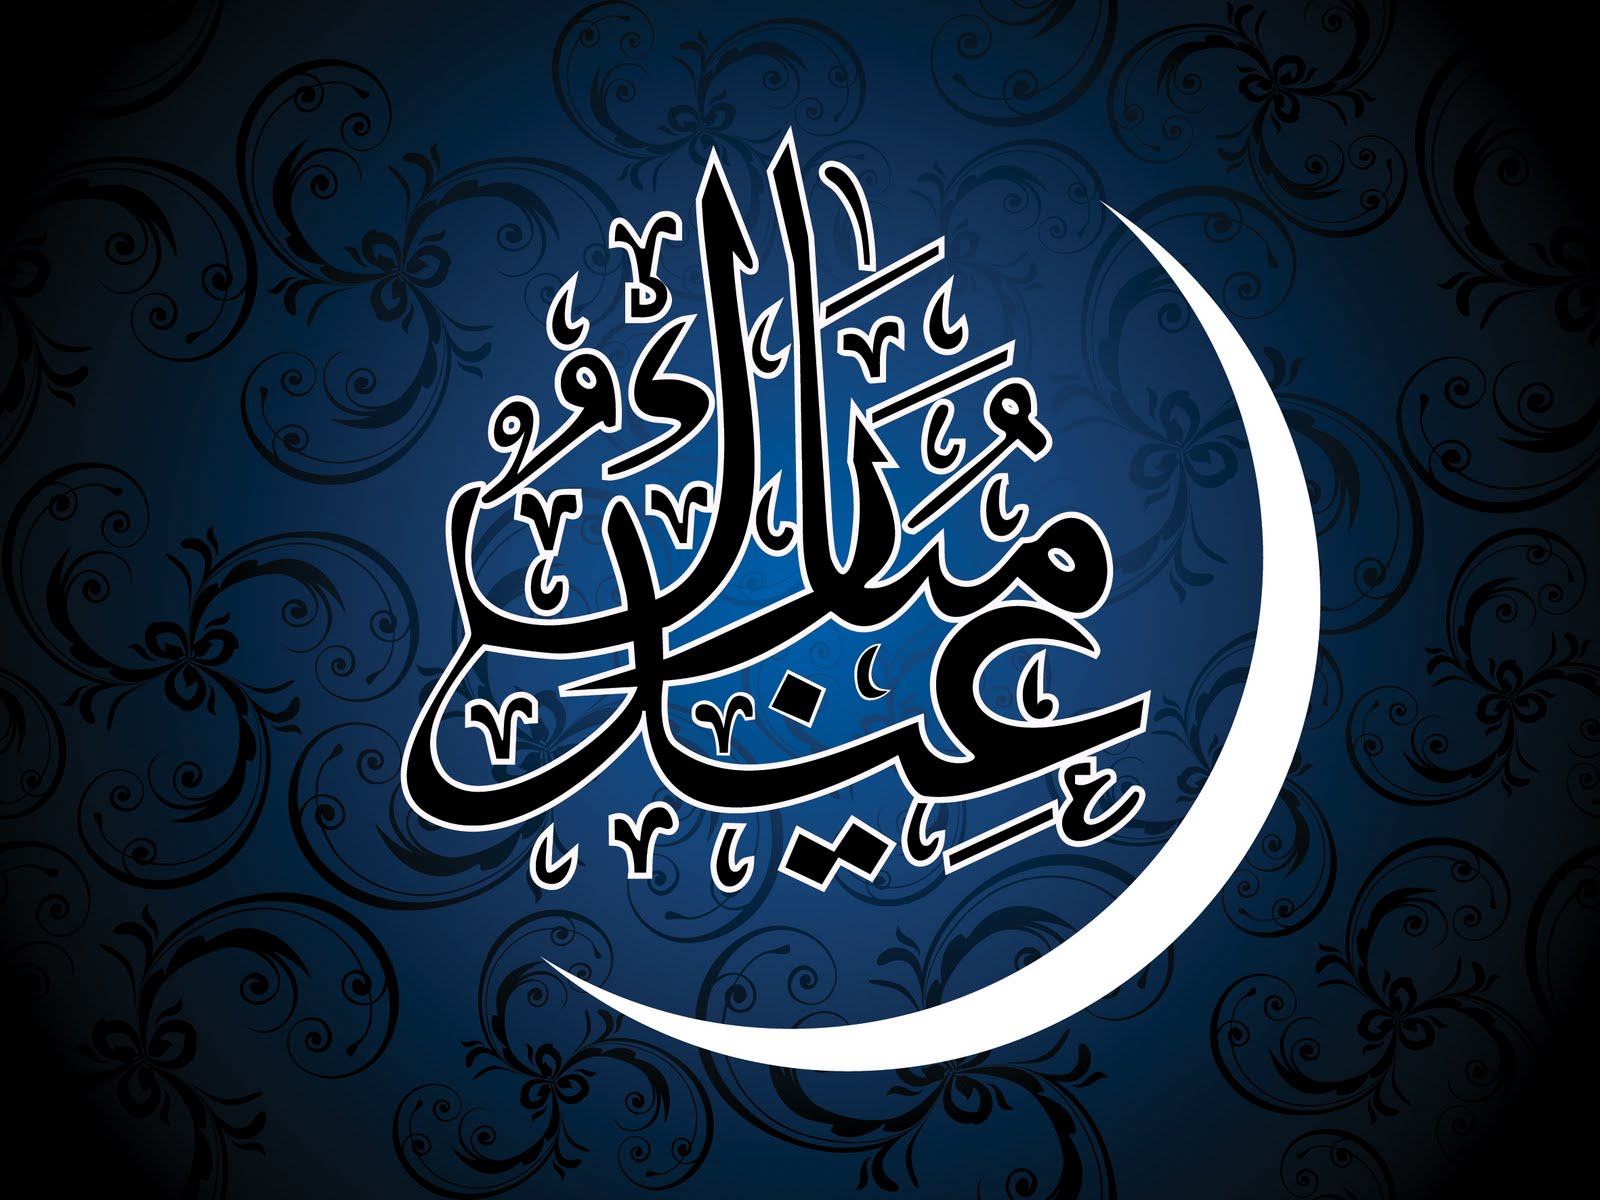 chez chiara عيد مبارك eid al fitr kareem happy eid al fitr  عيد مبارك eid al fitr kareem happy eid al fitr 1432 2011